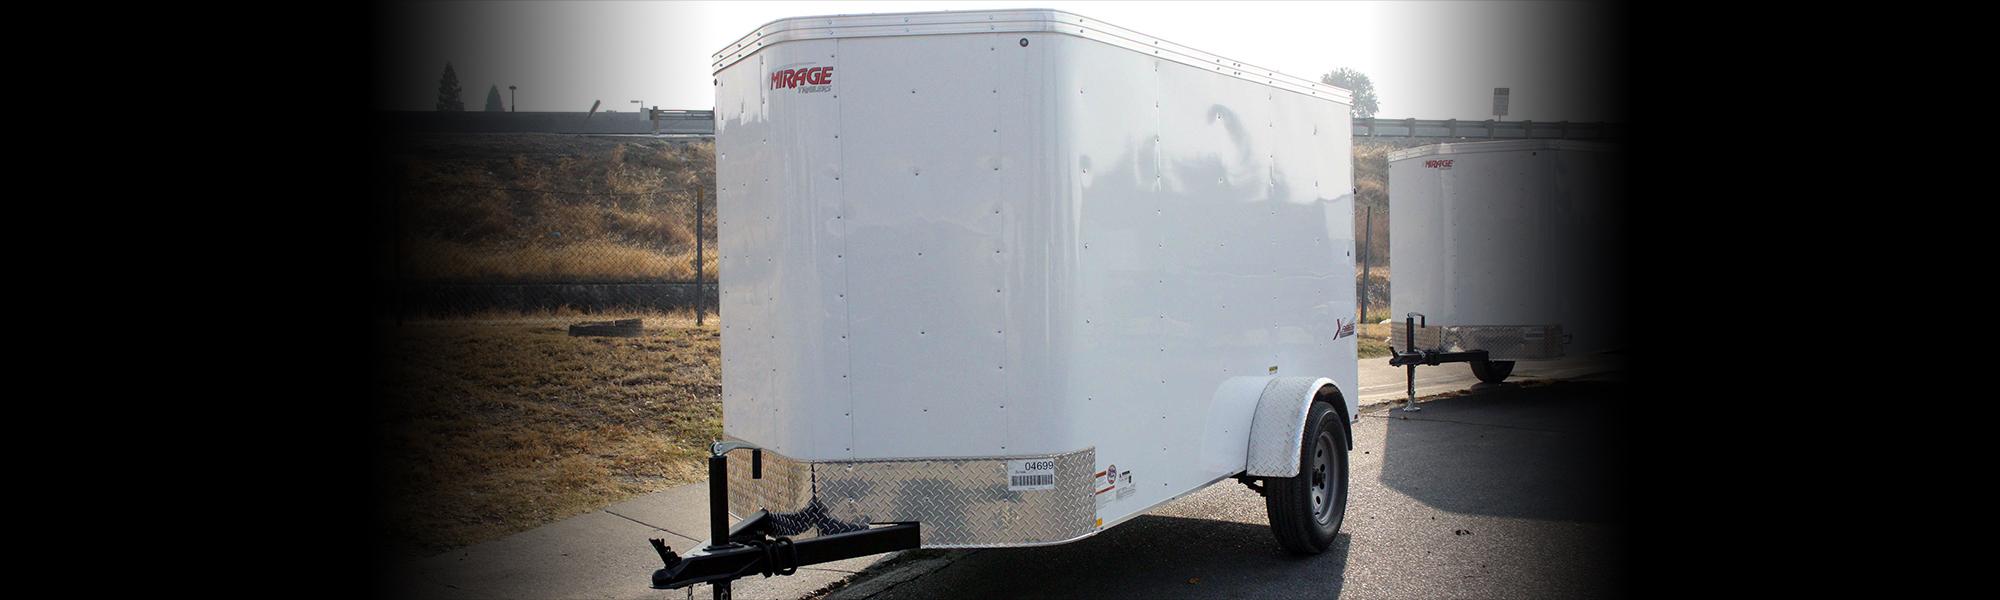 Home | Spokane North Trailers in Spokane Wa | Bear Track and